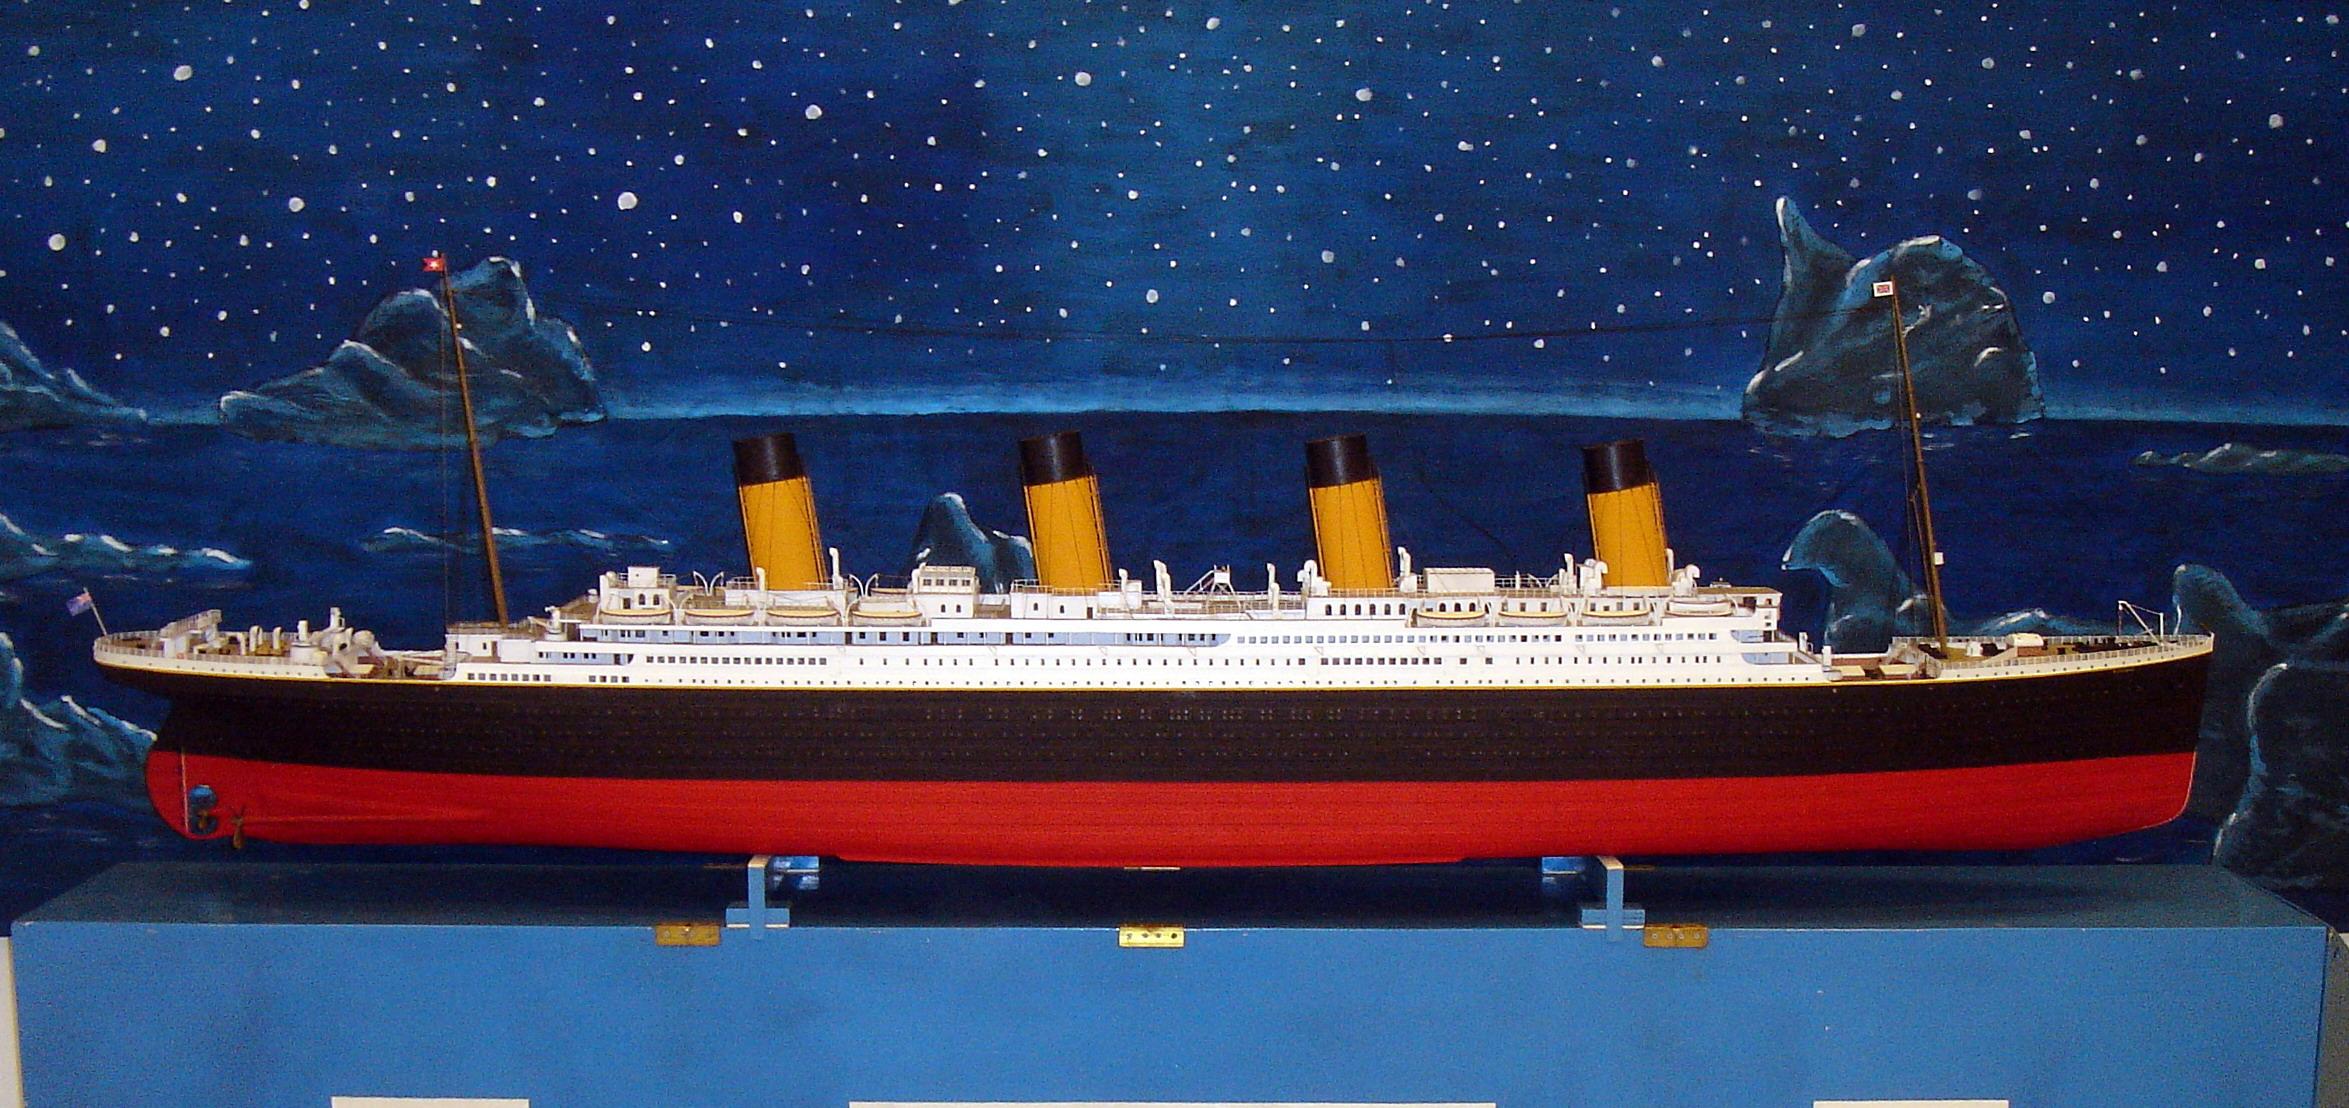 http://www.mitidelmare.it/FOTO%20GRANDI/Titanic%20fra%20i%20ghiacci.jpg